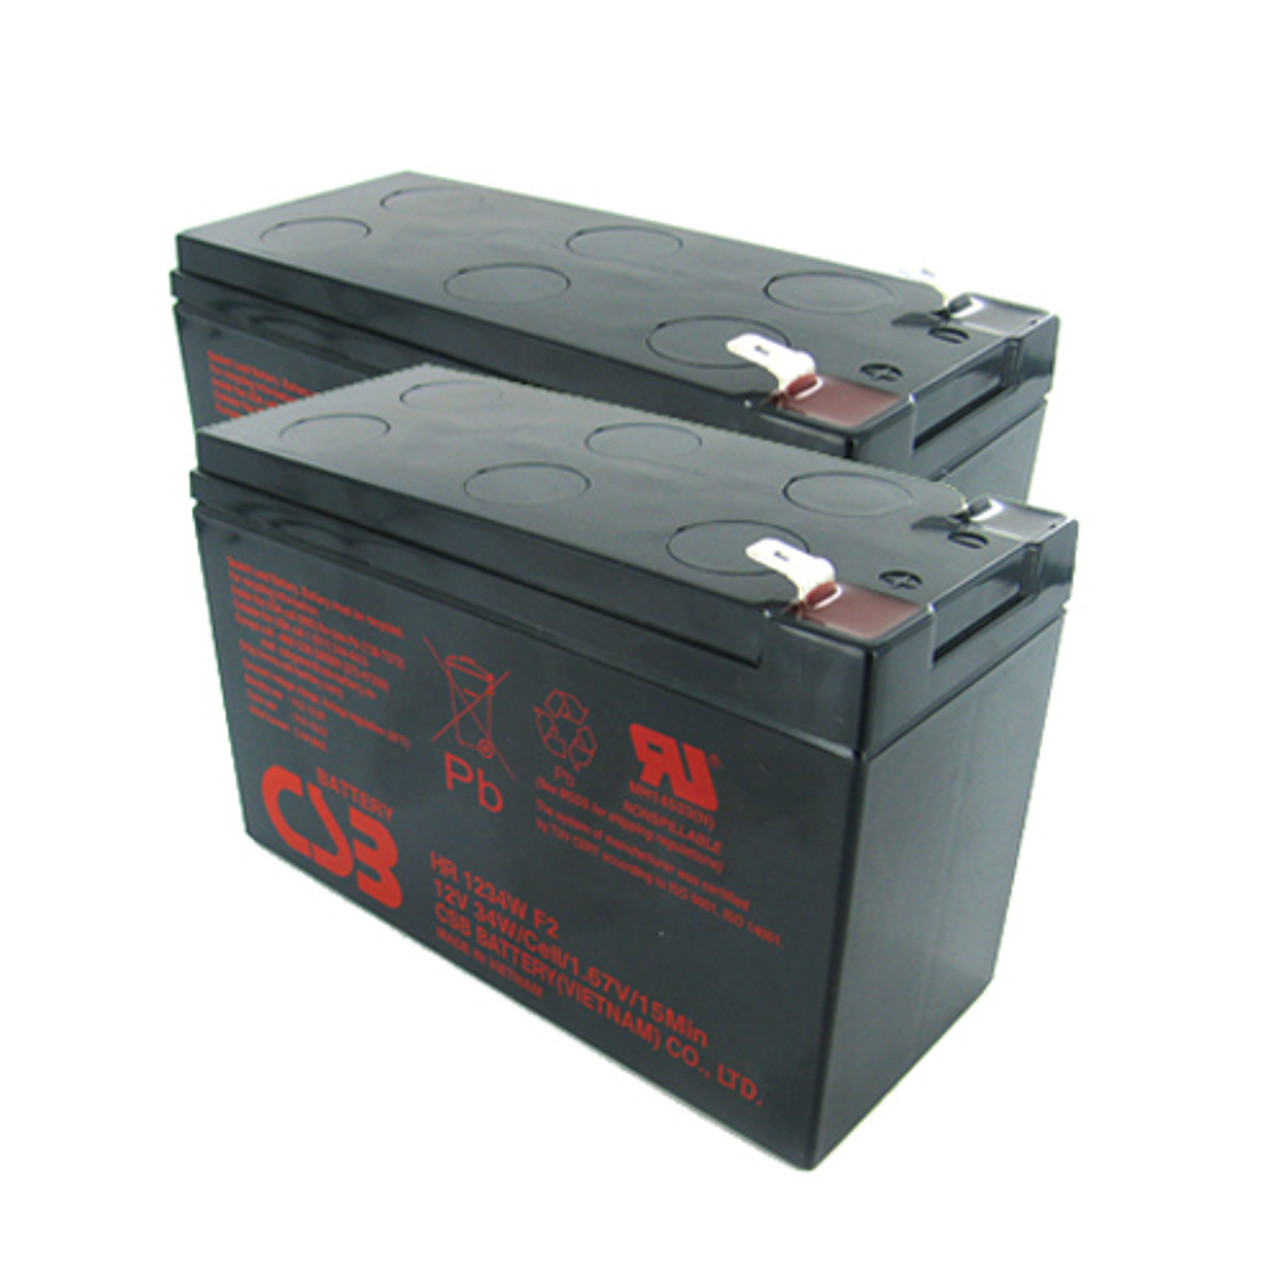 Powerware FX2002 UPS Replacement Battery Set